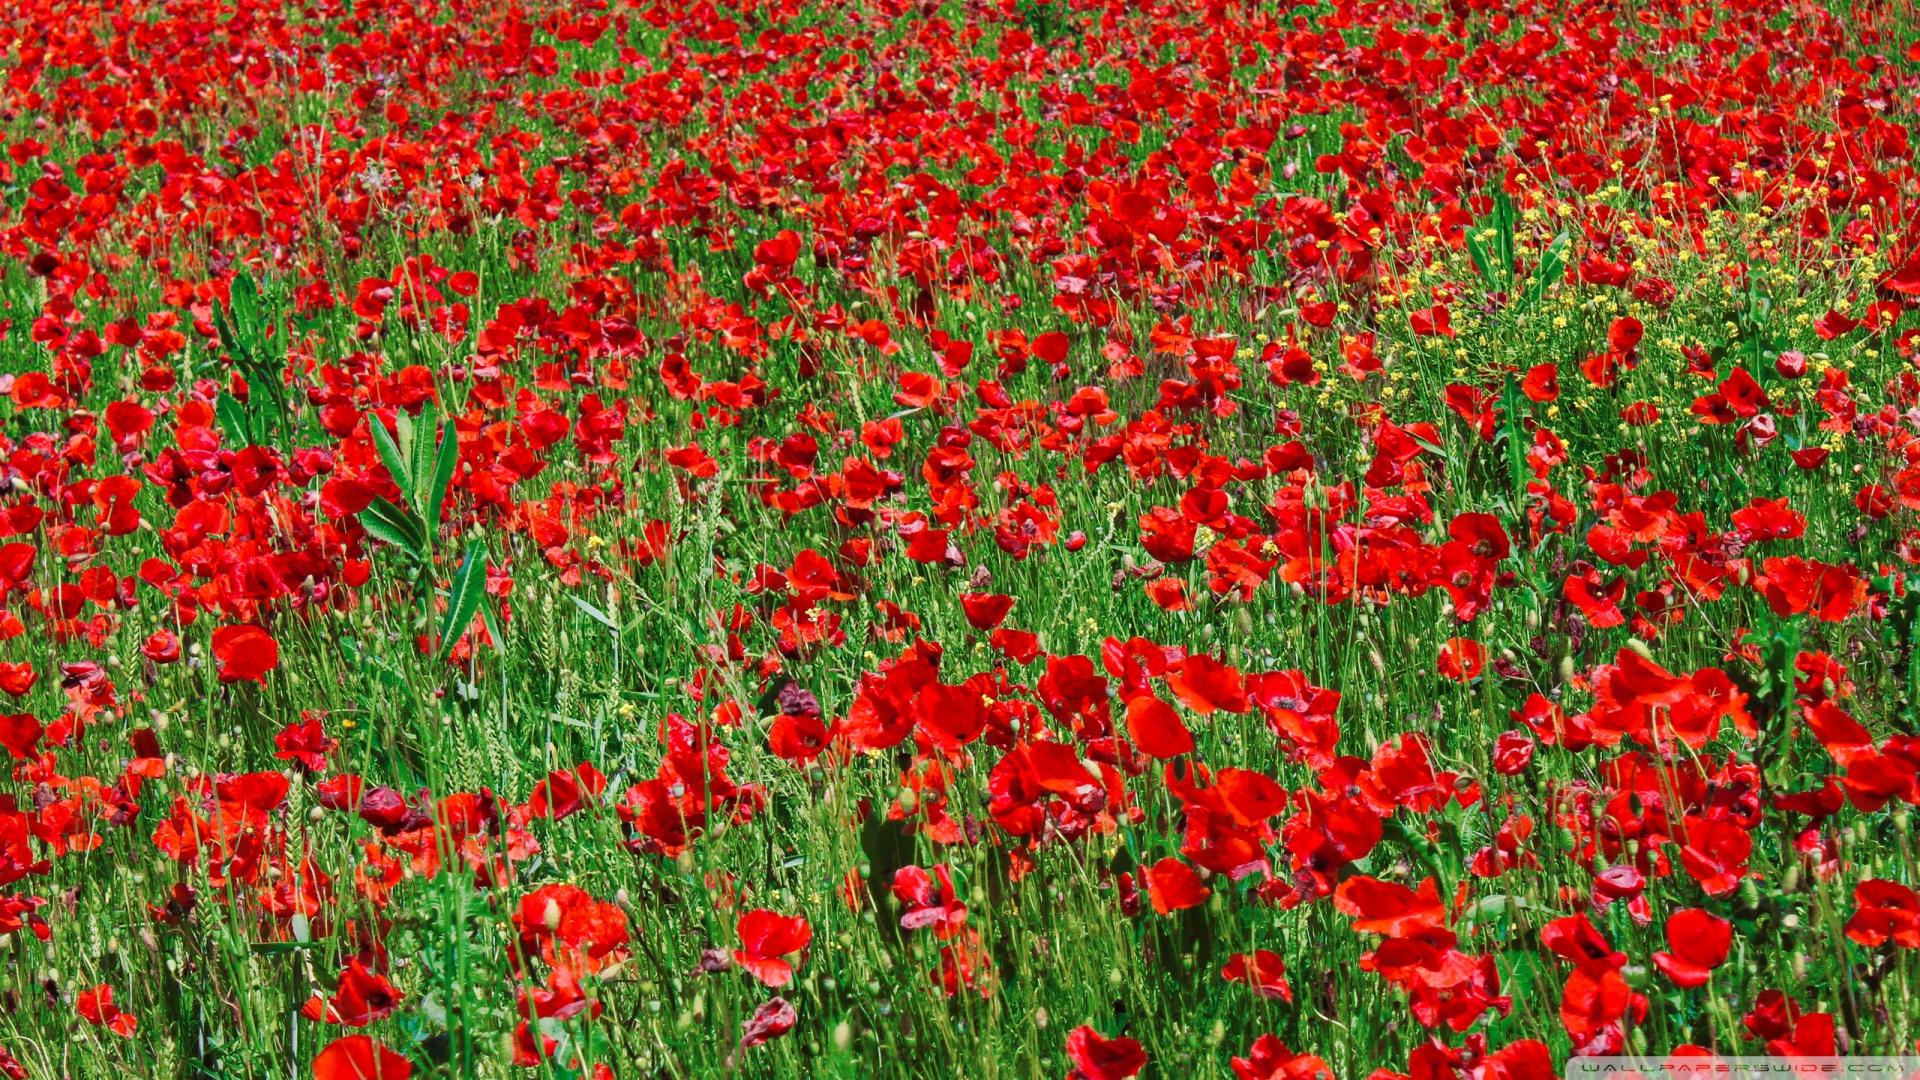 Red Poppy Field Wallpaper 1920x1080 Red Poppy Field 1920x1080